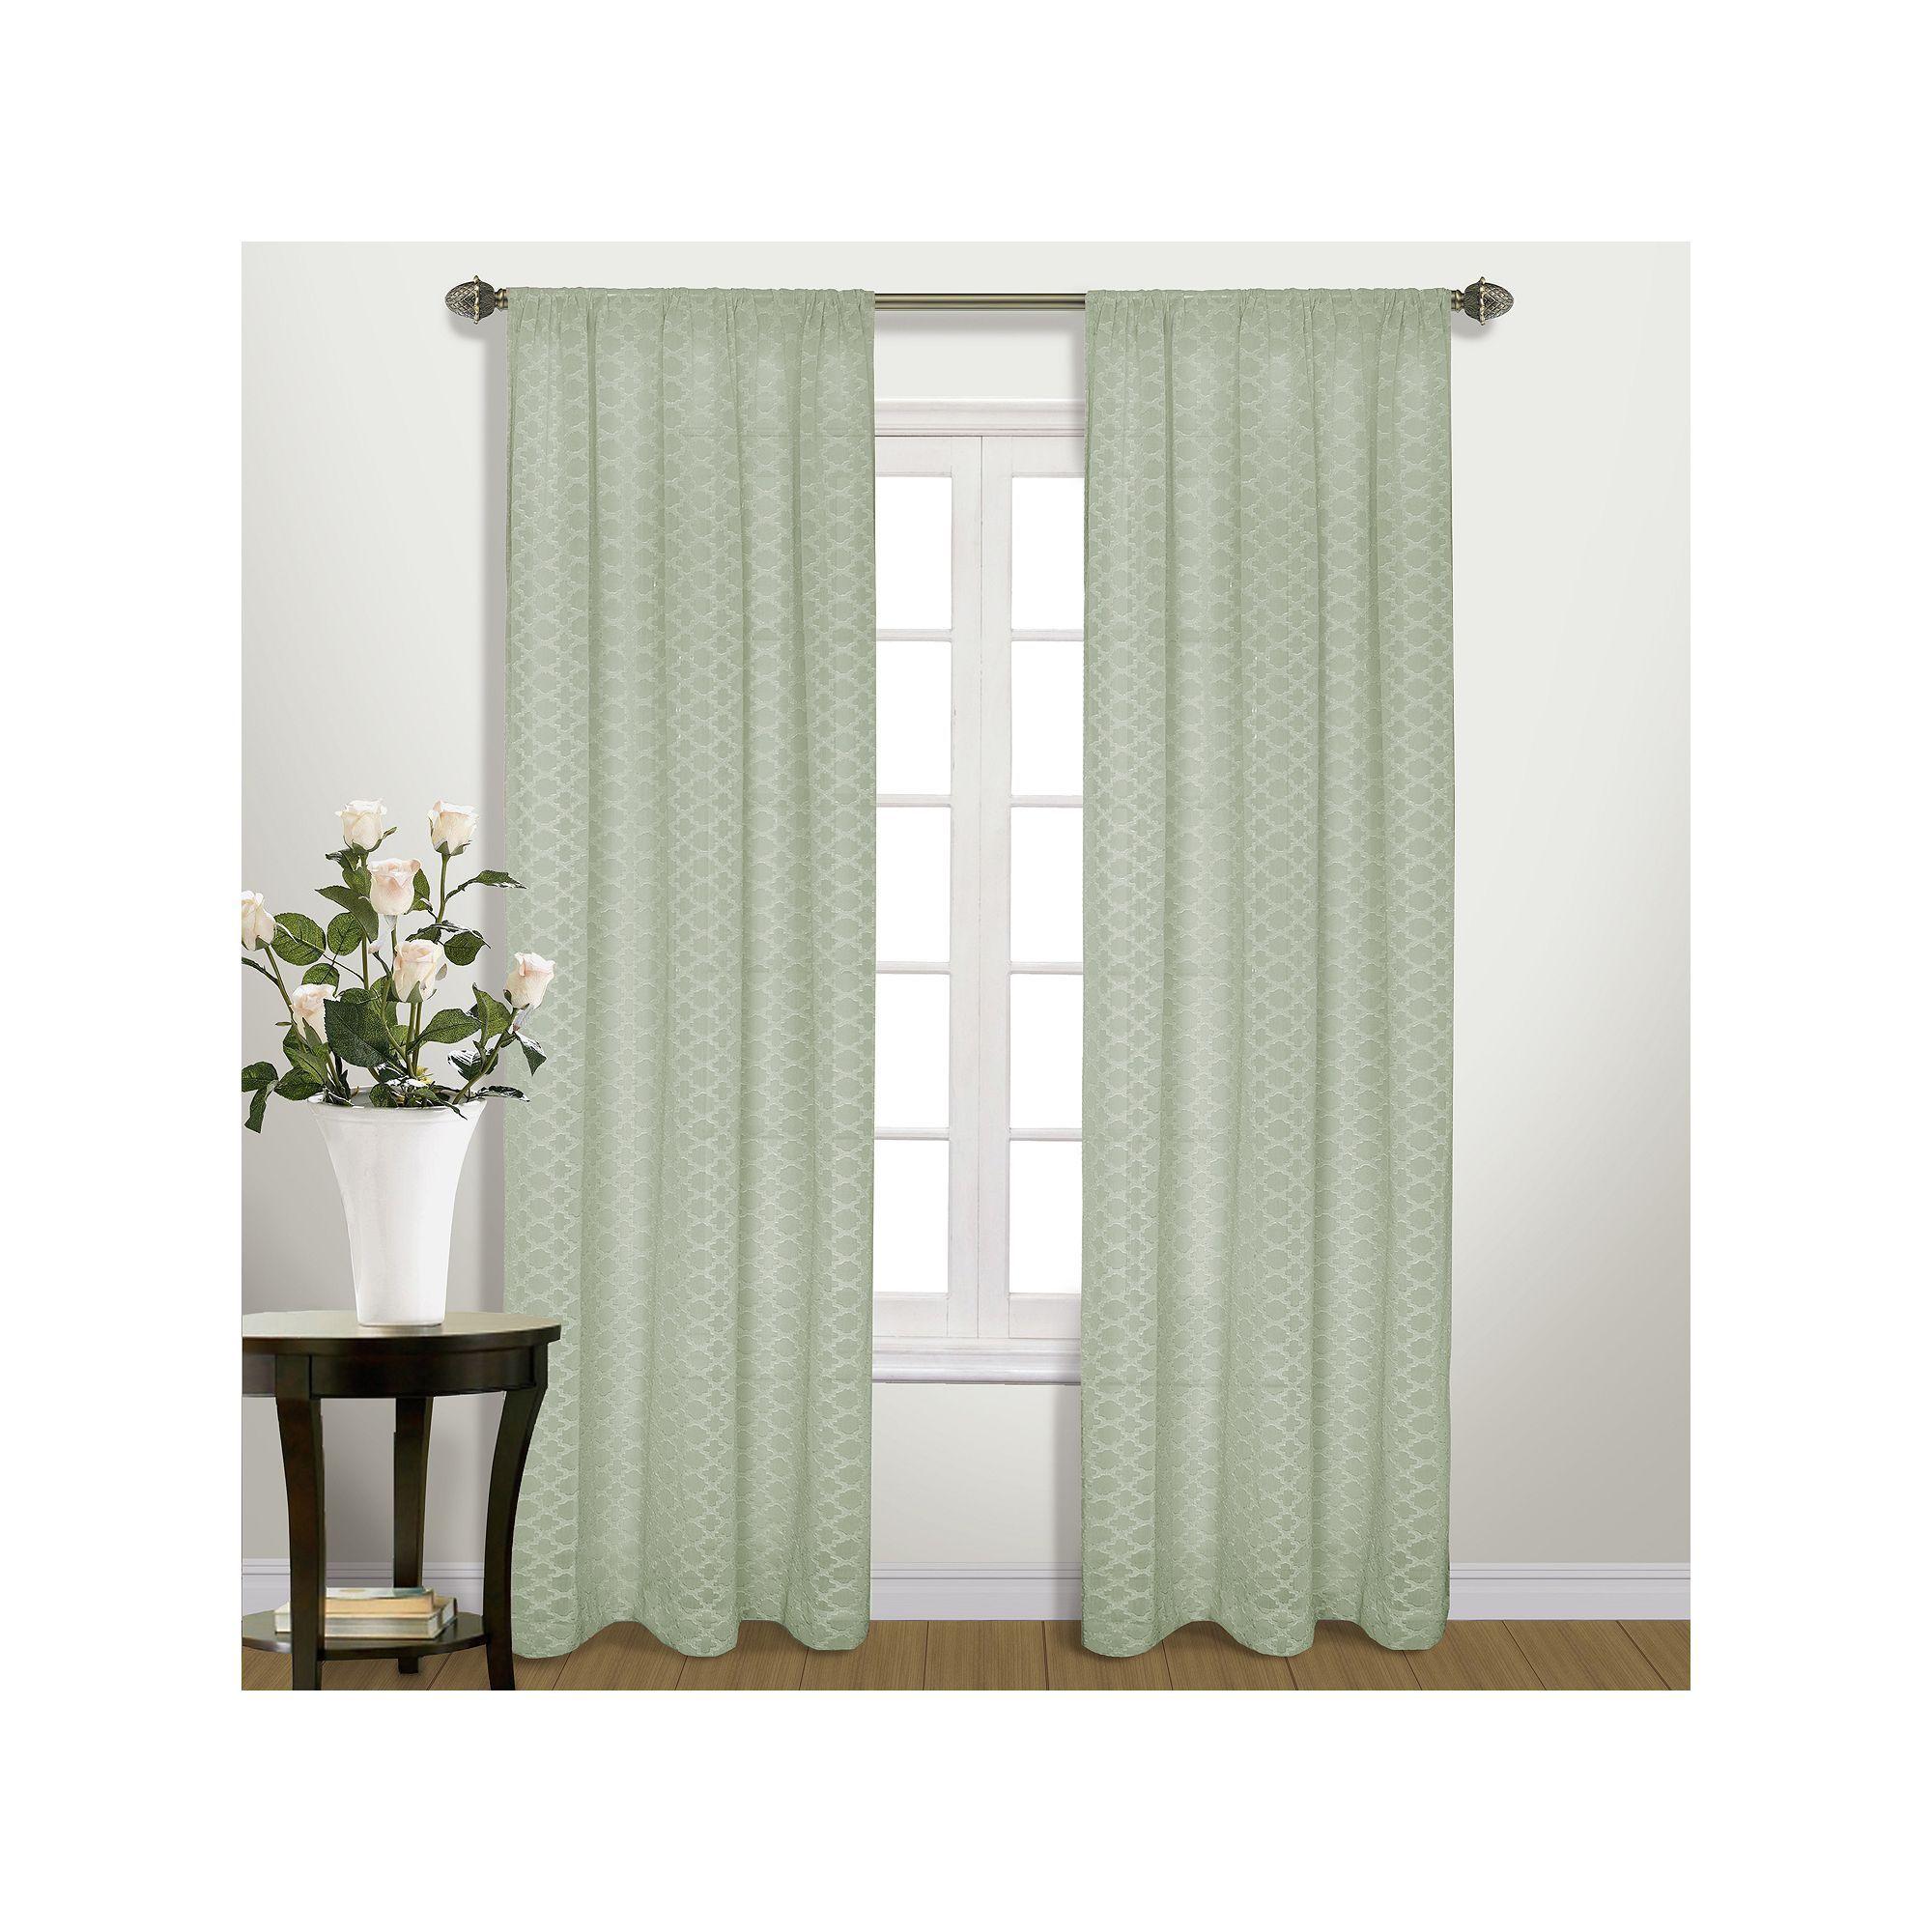 United Curtain Co Belmont Semi Sheer Window Curtain Curtains